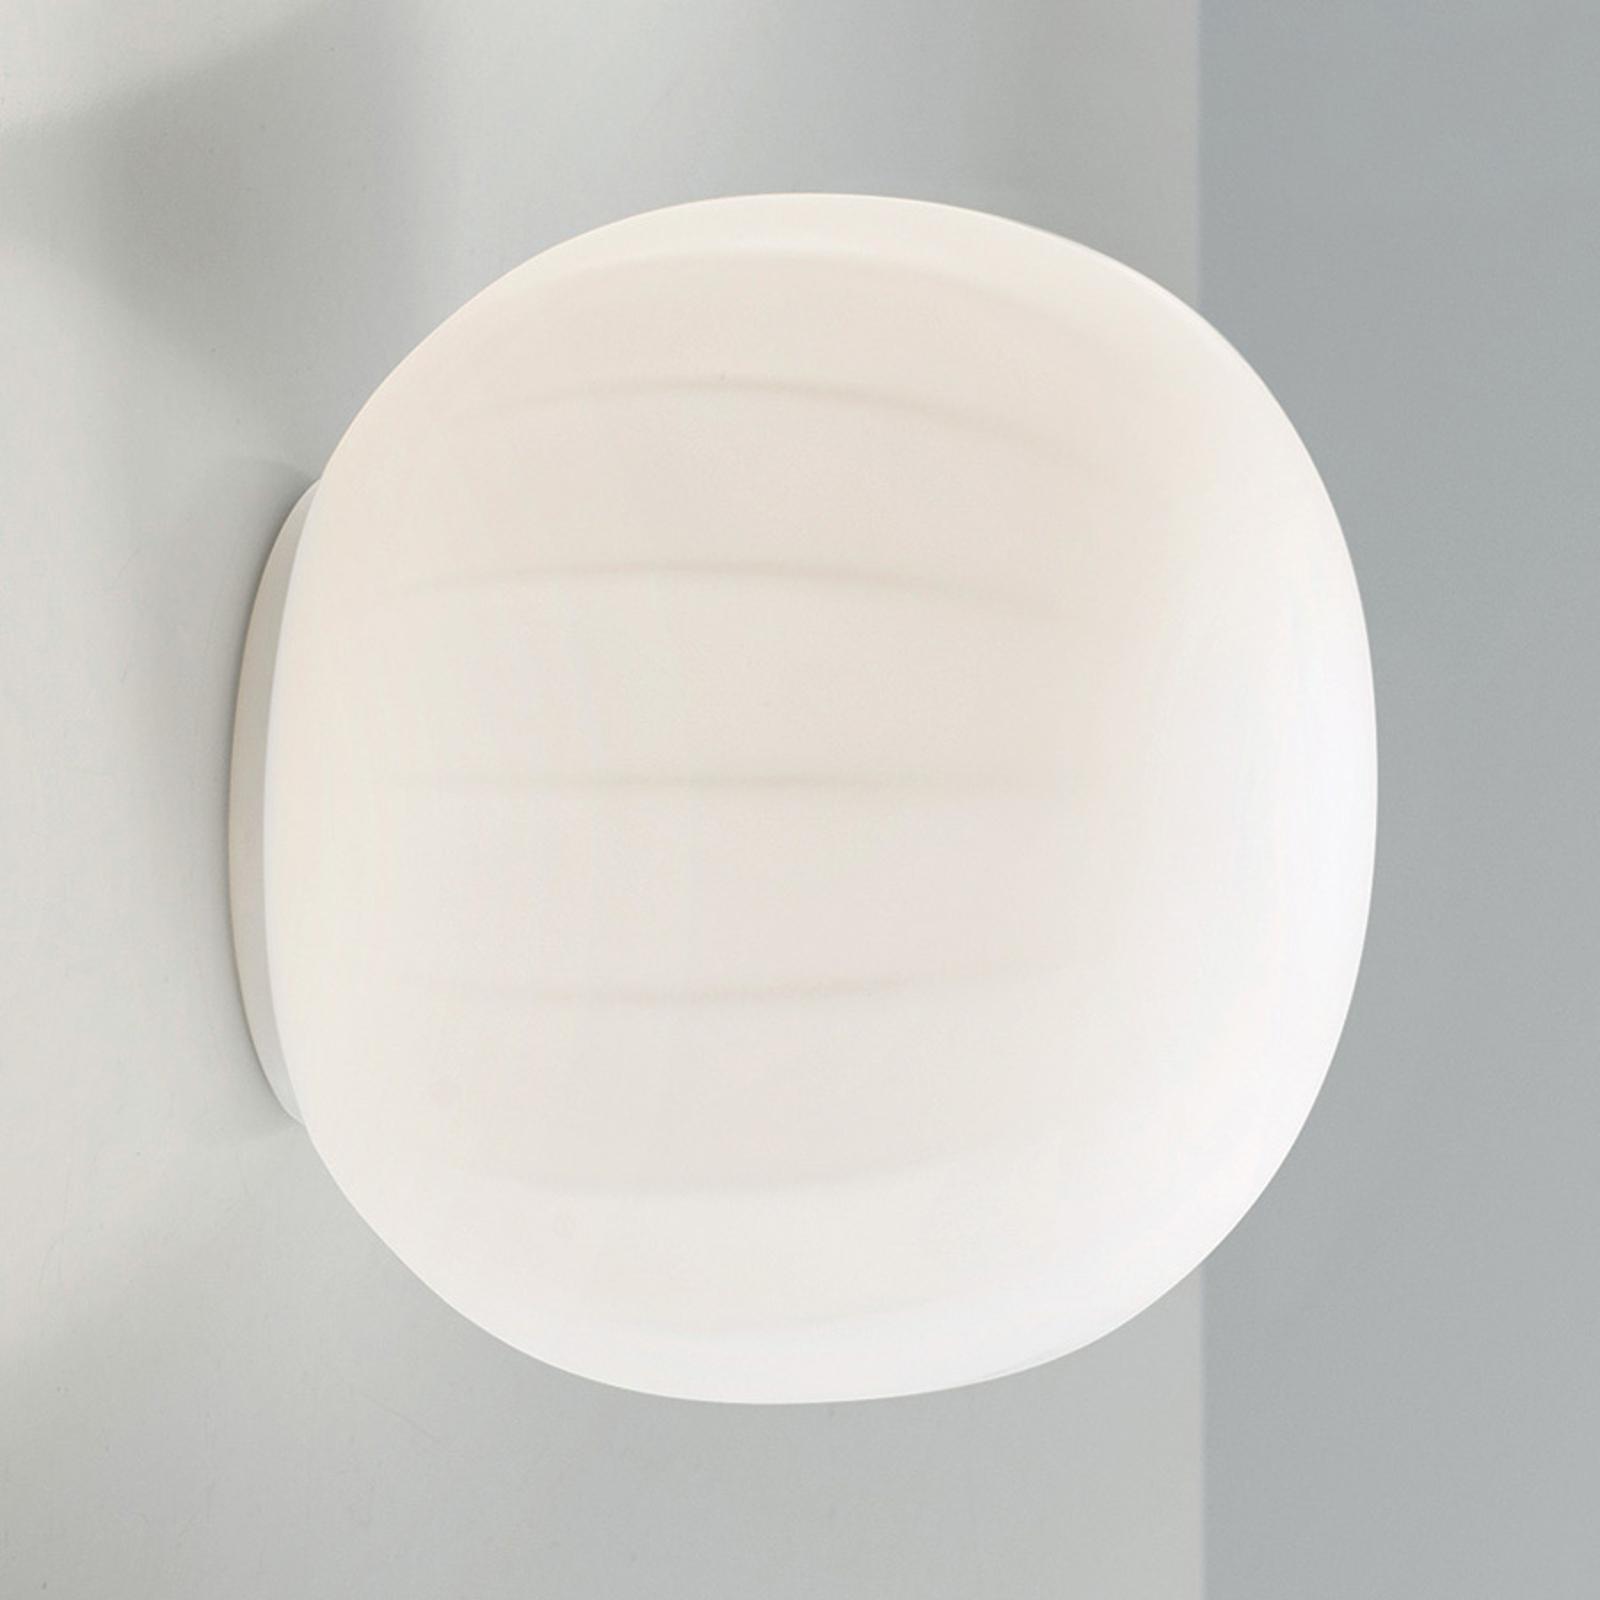 Luceplan Lita seinävalaisin Ø 18 cm